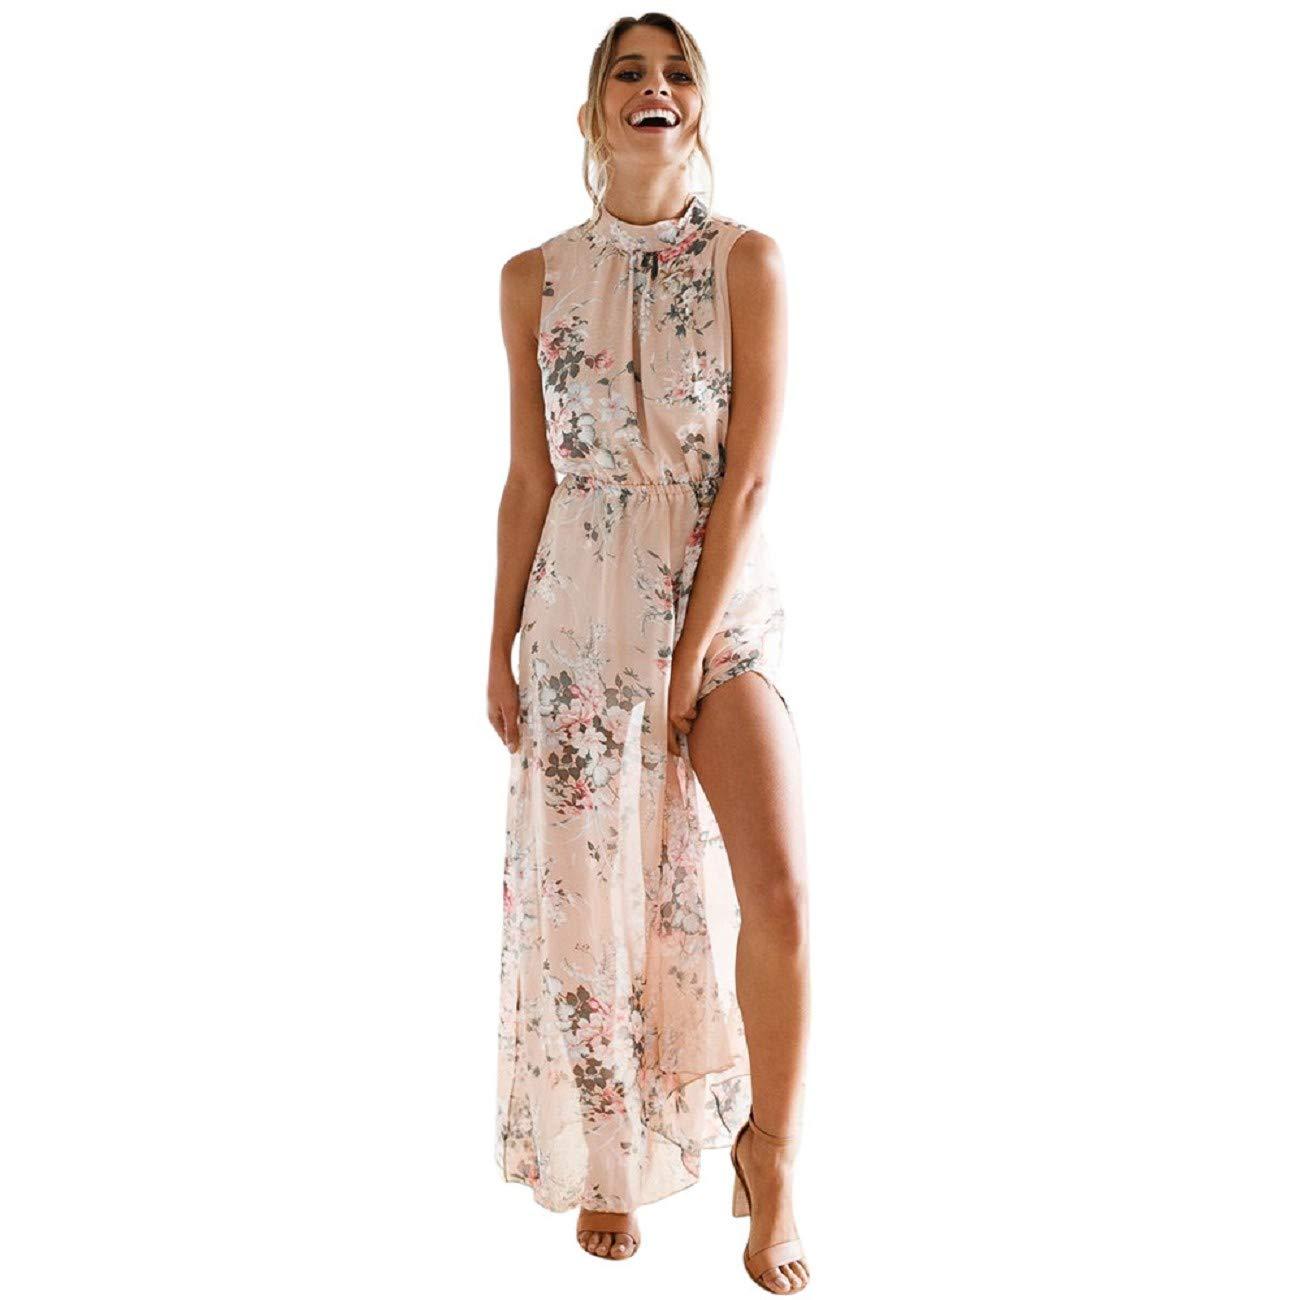 Women Maxi Dress FAPIZI Chiffon Floral Print Sleeveless Backless Casual Boho Turtleneck Beach Long Dress Pink by FAPIZI Women Dresses